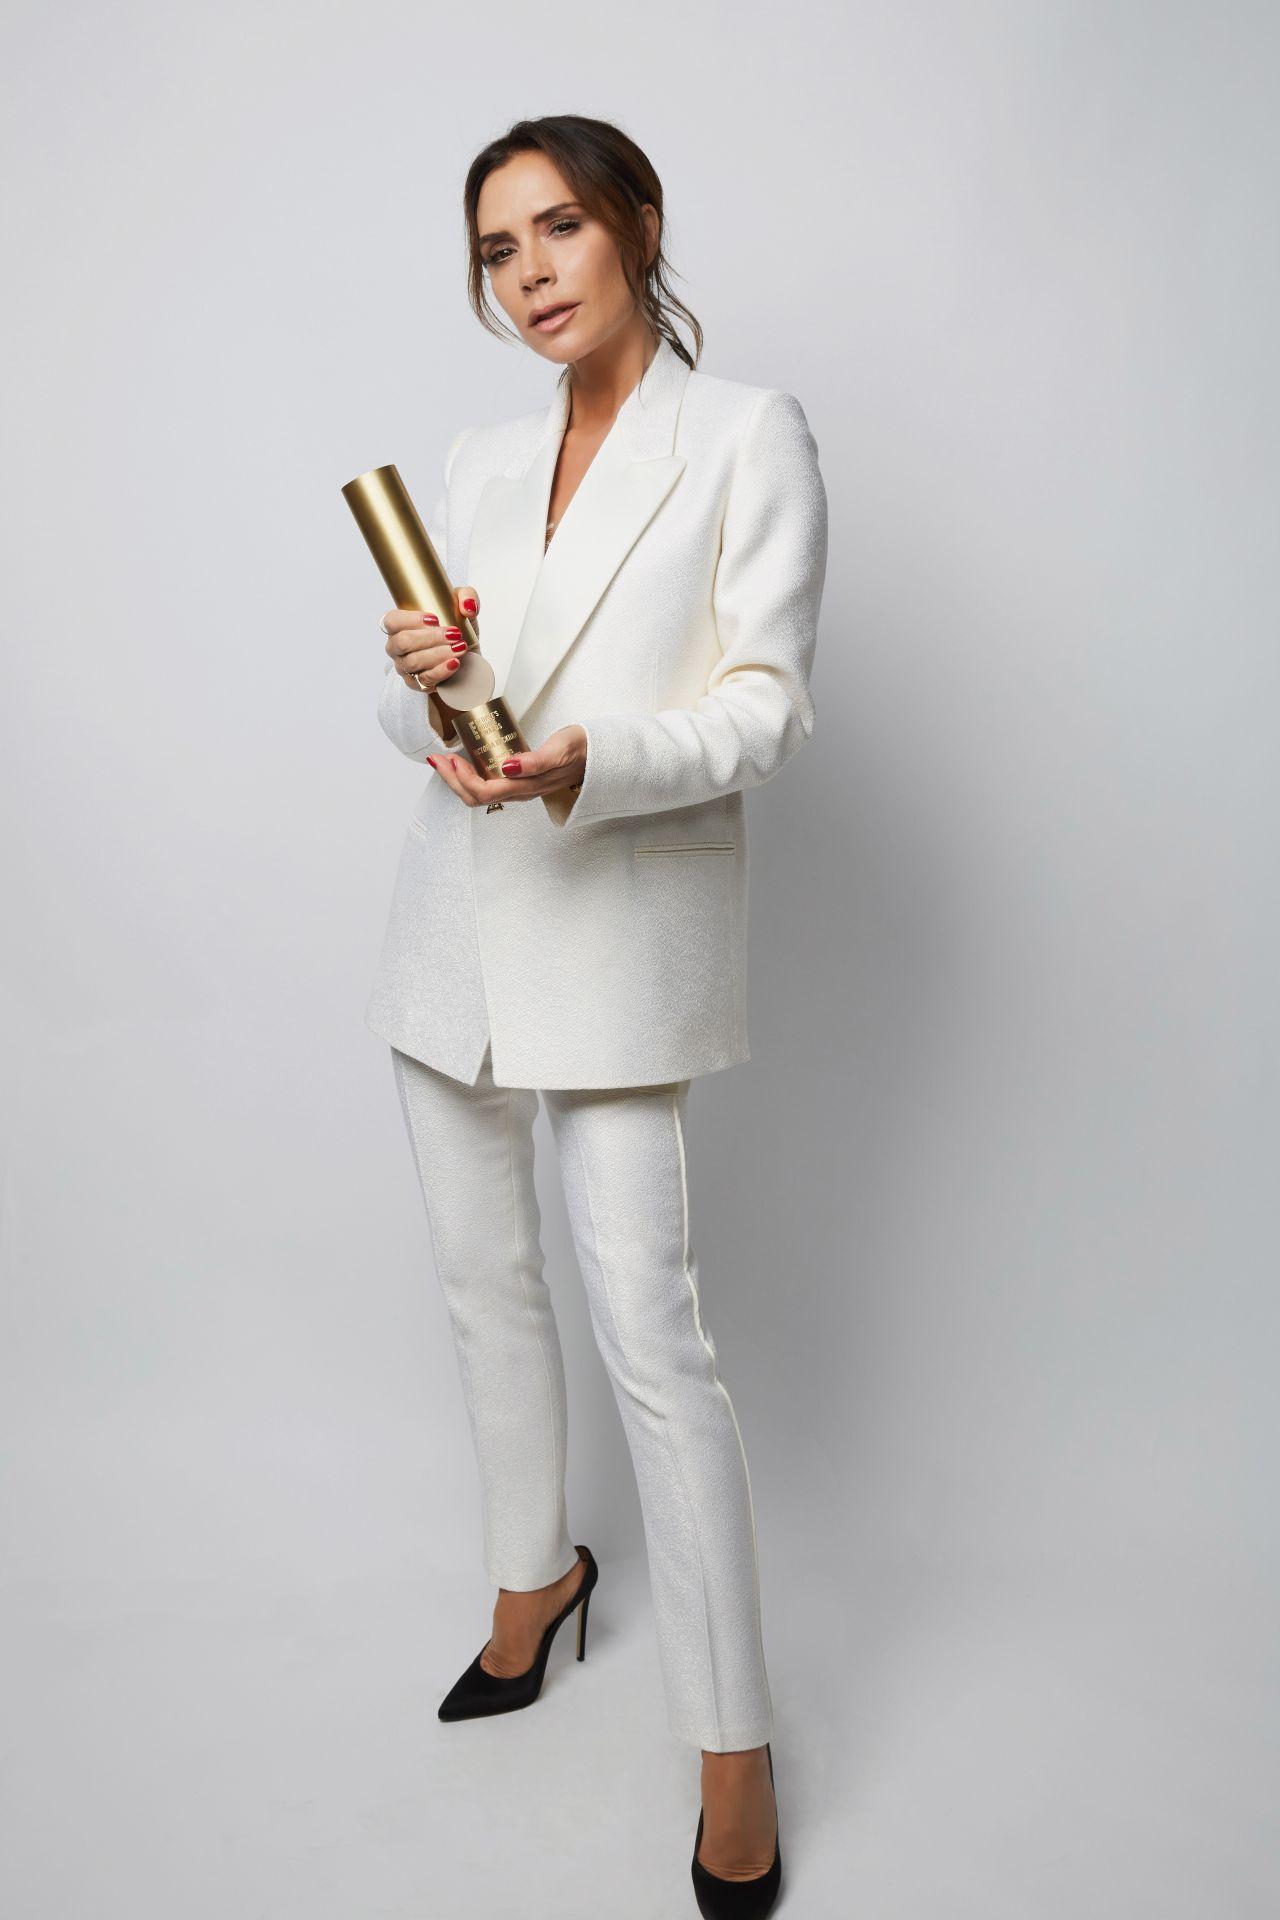 https://celebmafia.com/wp-content/uploads/2018/11/victoria-beckham-2018-people-s-choice-awards-portrait-2.jpg